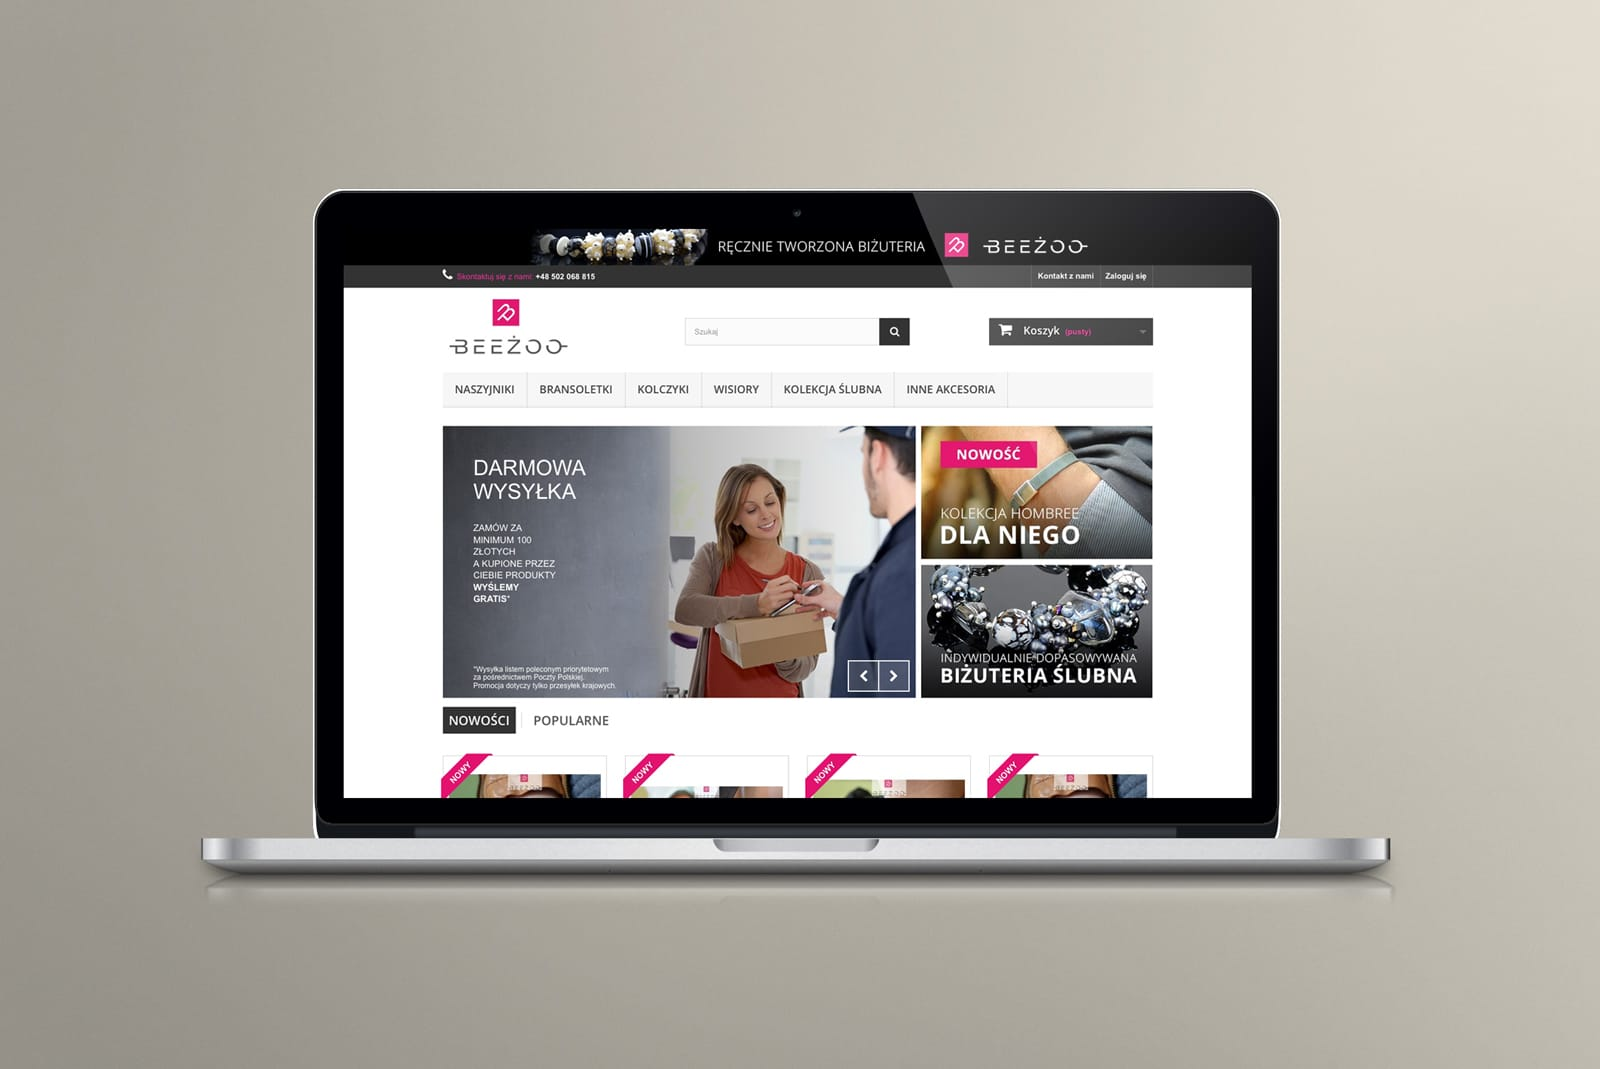 Beeżoo sklep internetowy Agencja brandingowa Moweli Creative